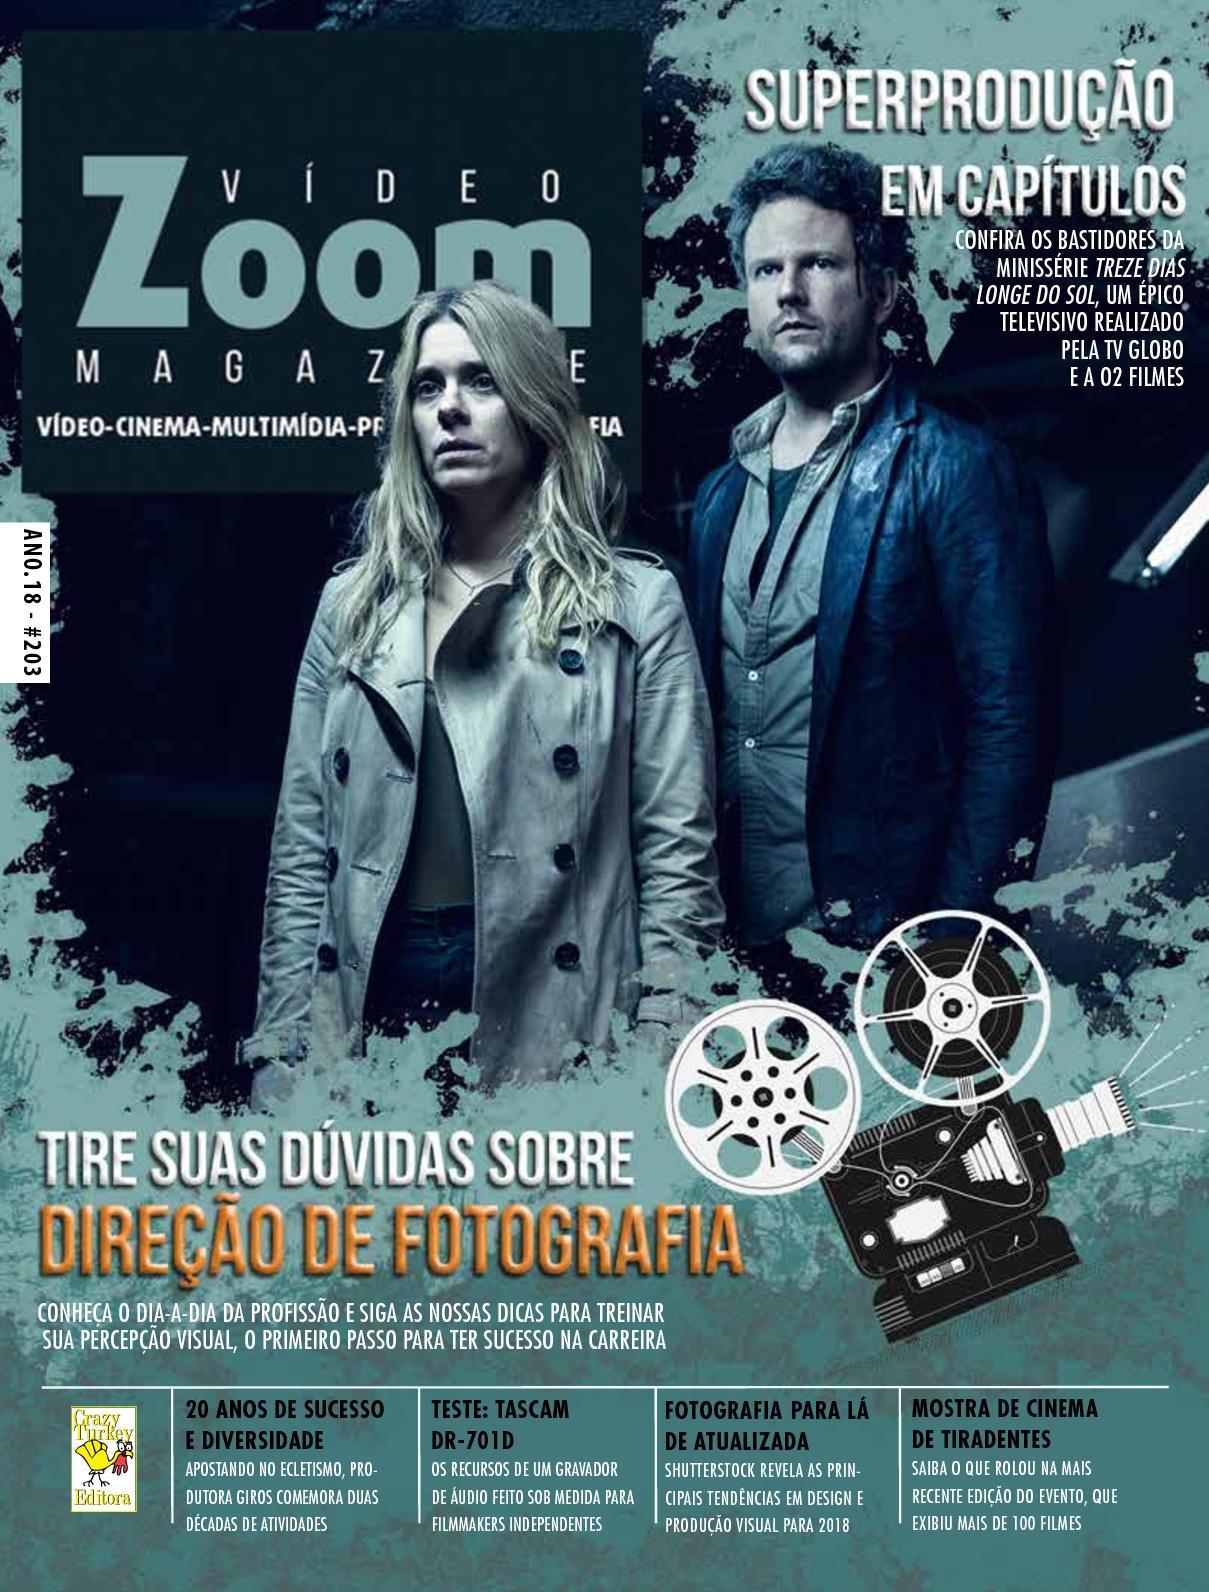 f3adabef1 Calaméo - Zoom Magazine 203